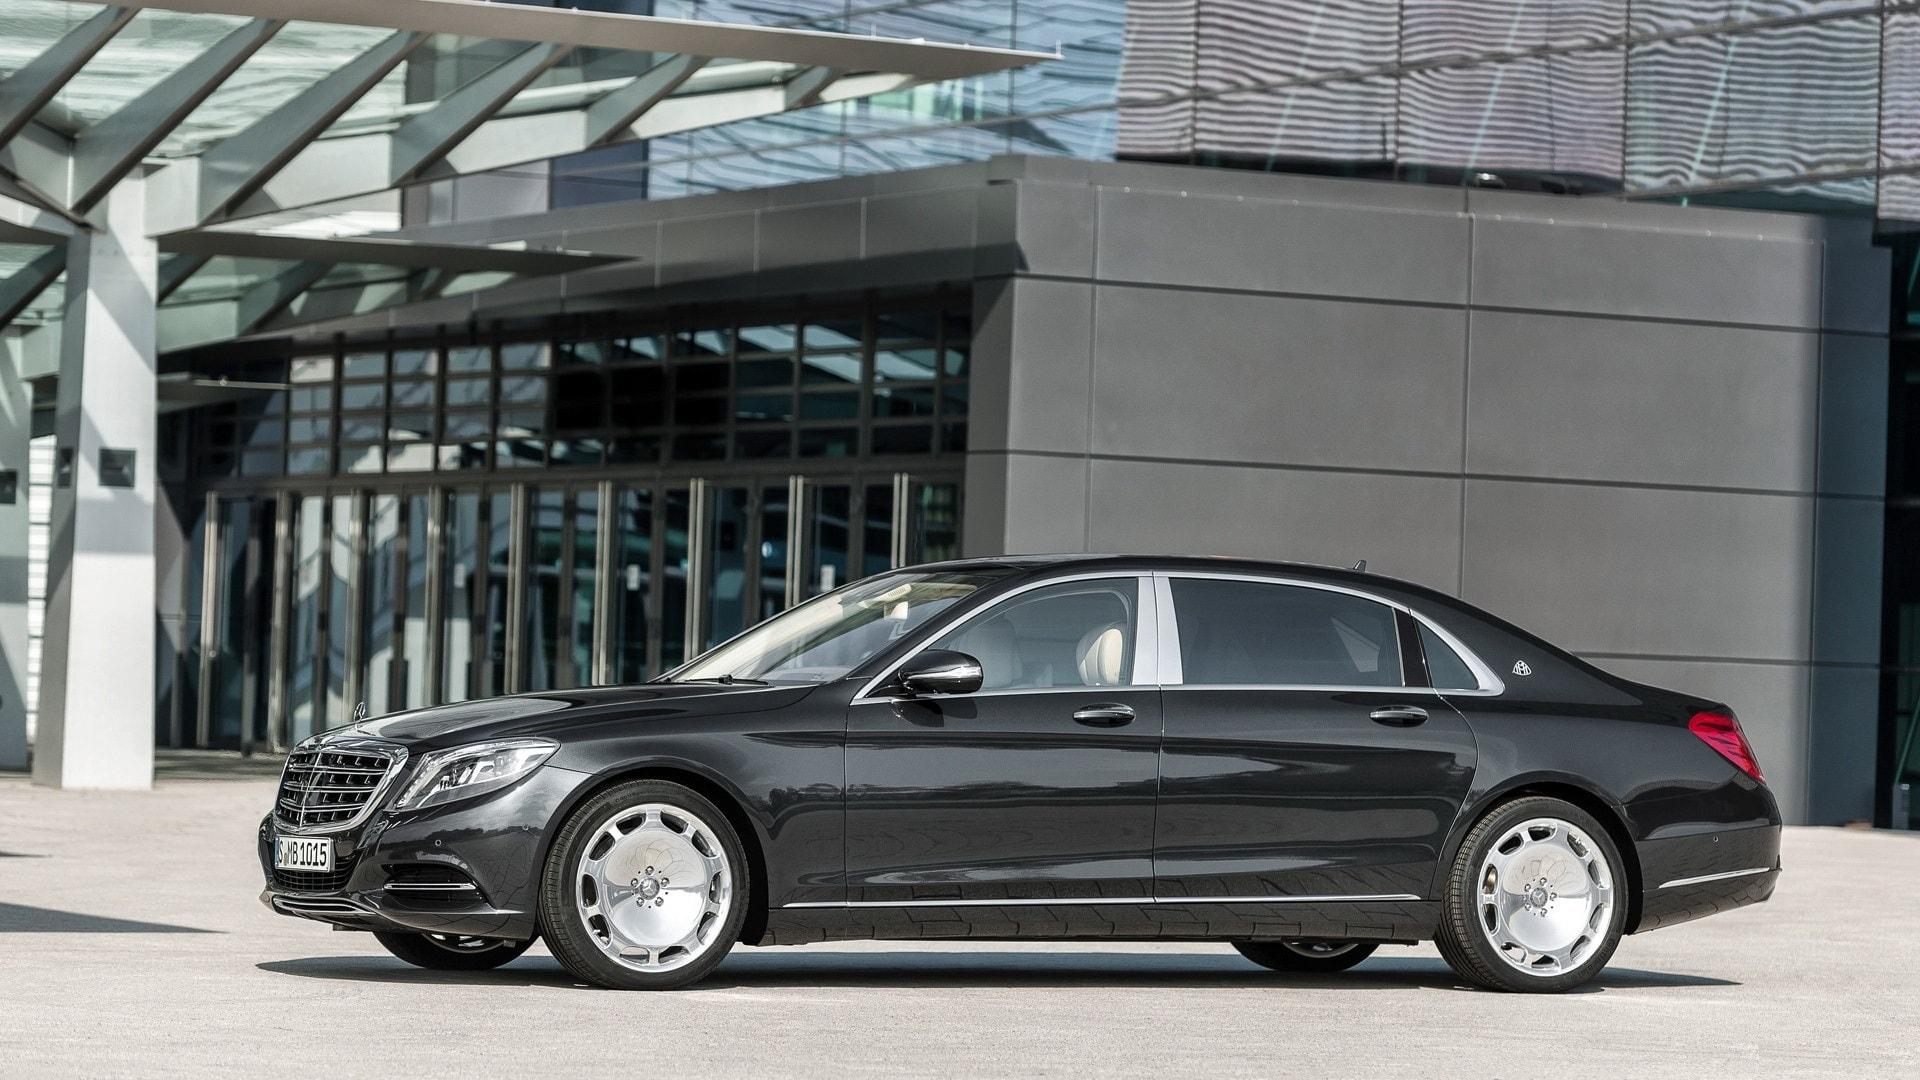 Mercedes-Maybach S-Class HD pics